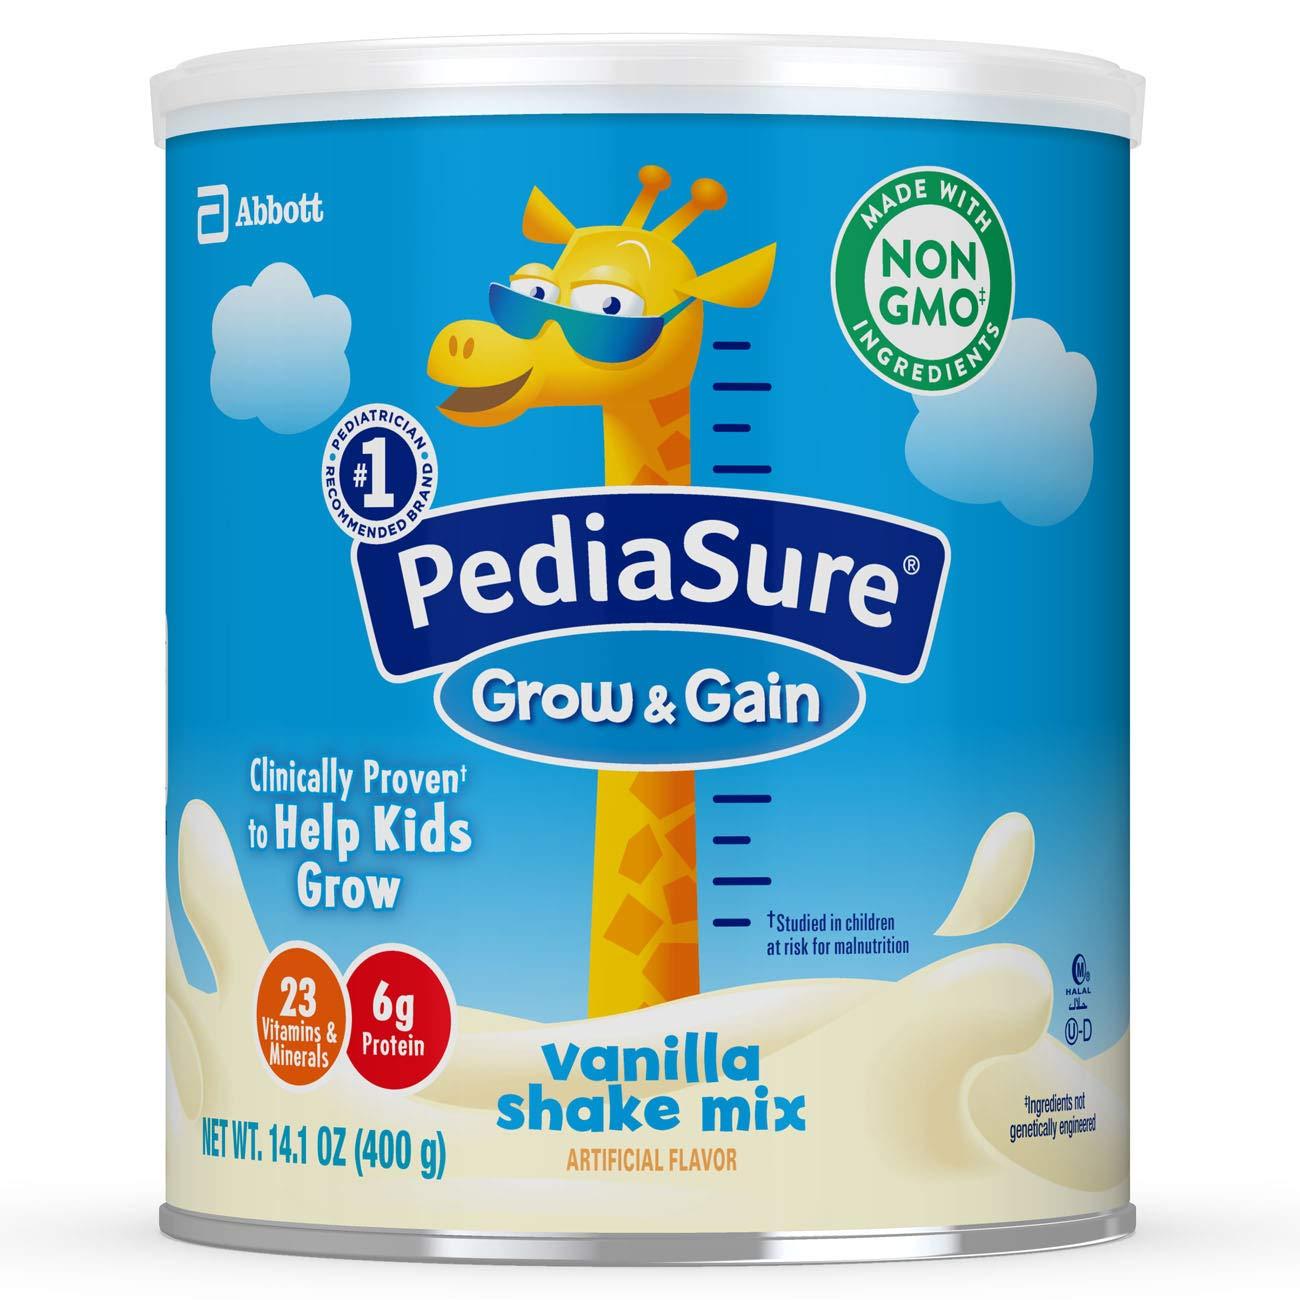 PediaSure Grow & Gain Vanilla Shake Mix, Nutrition Shake for Kids, 14.1 oz, 6 count by Pediasure Powder (Image #1)